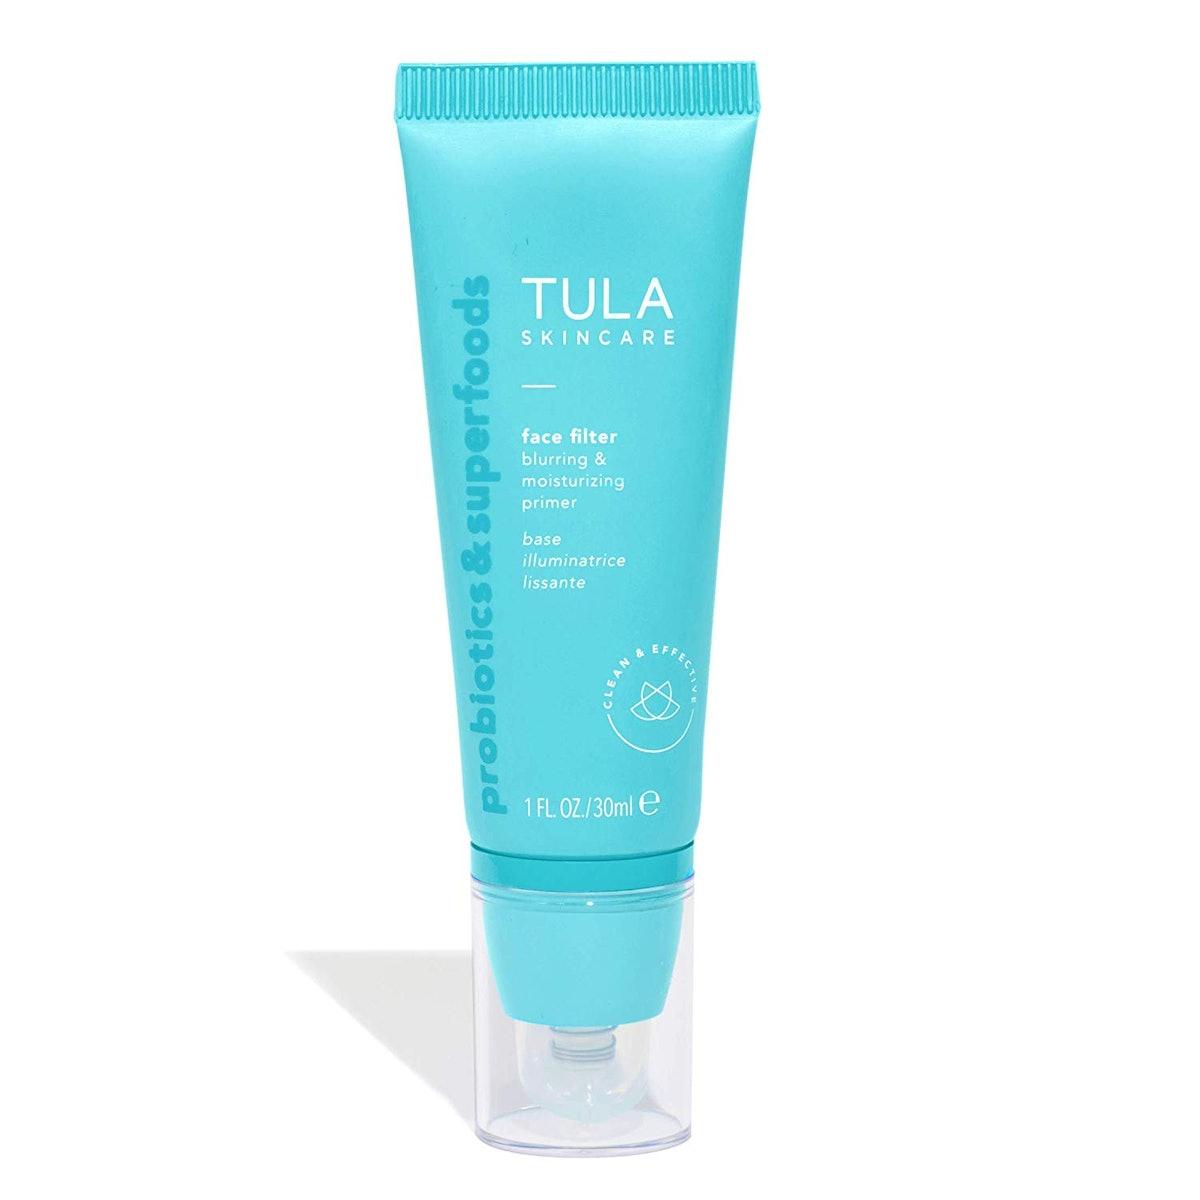 TULA Probiotic Skin Care Face Filter Blurring and Moisturizing Primer